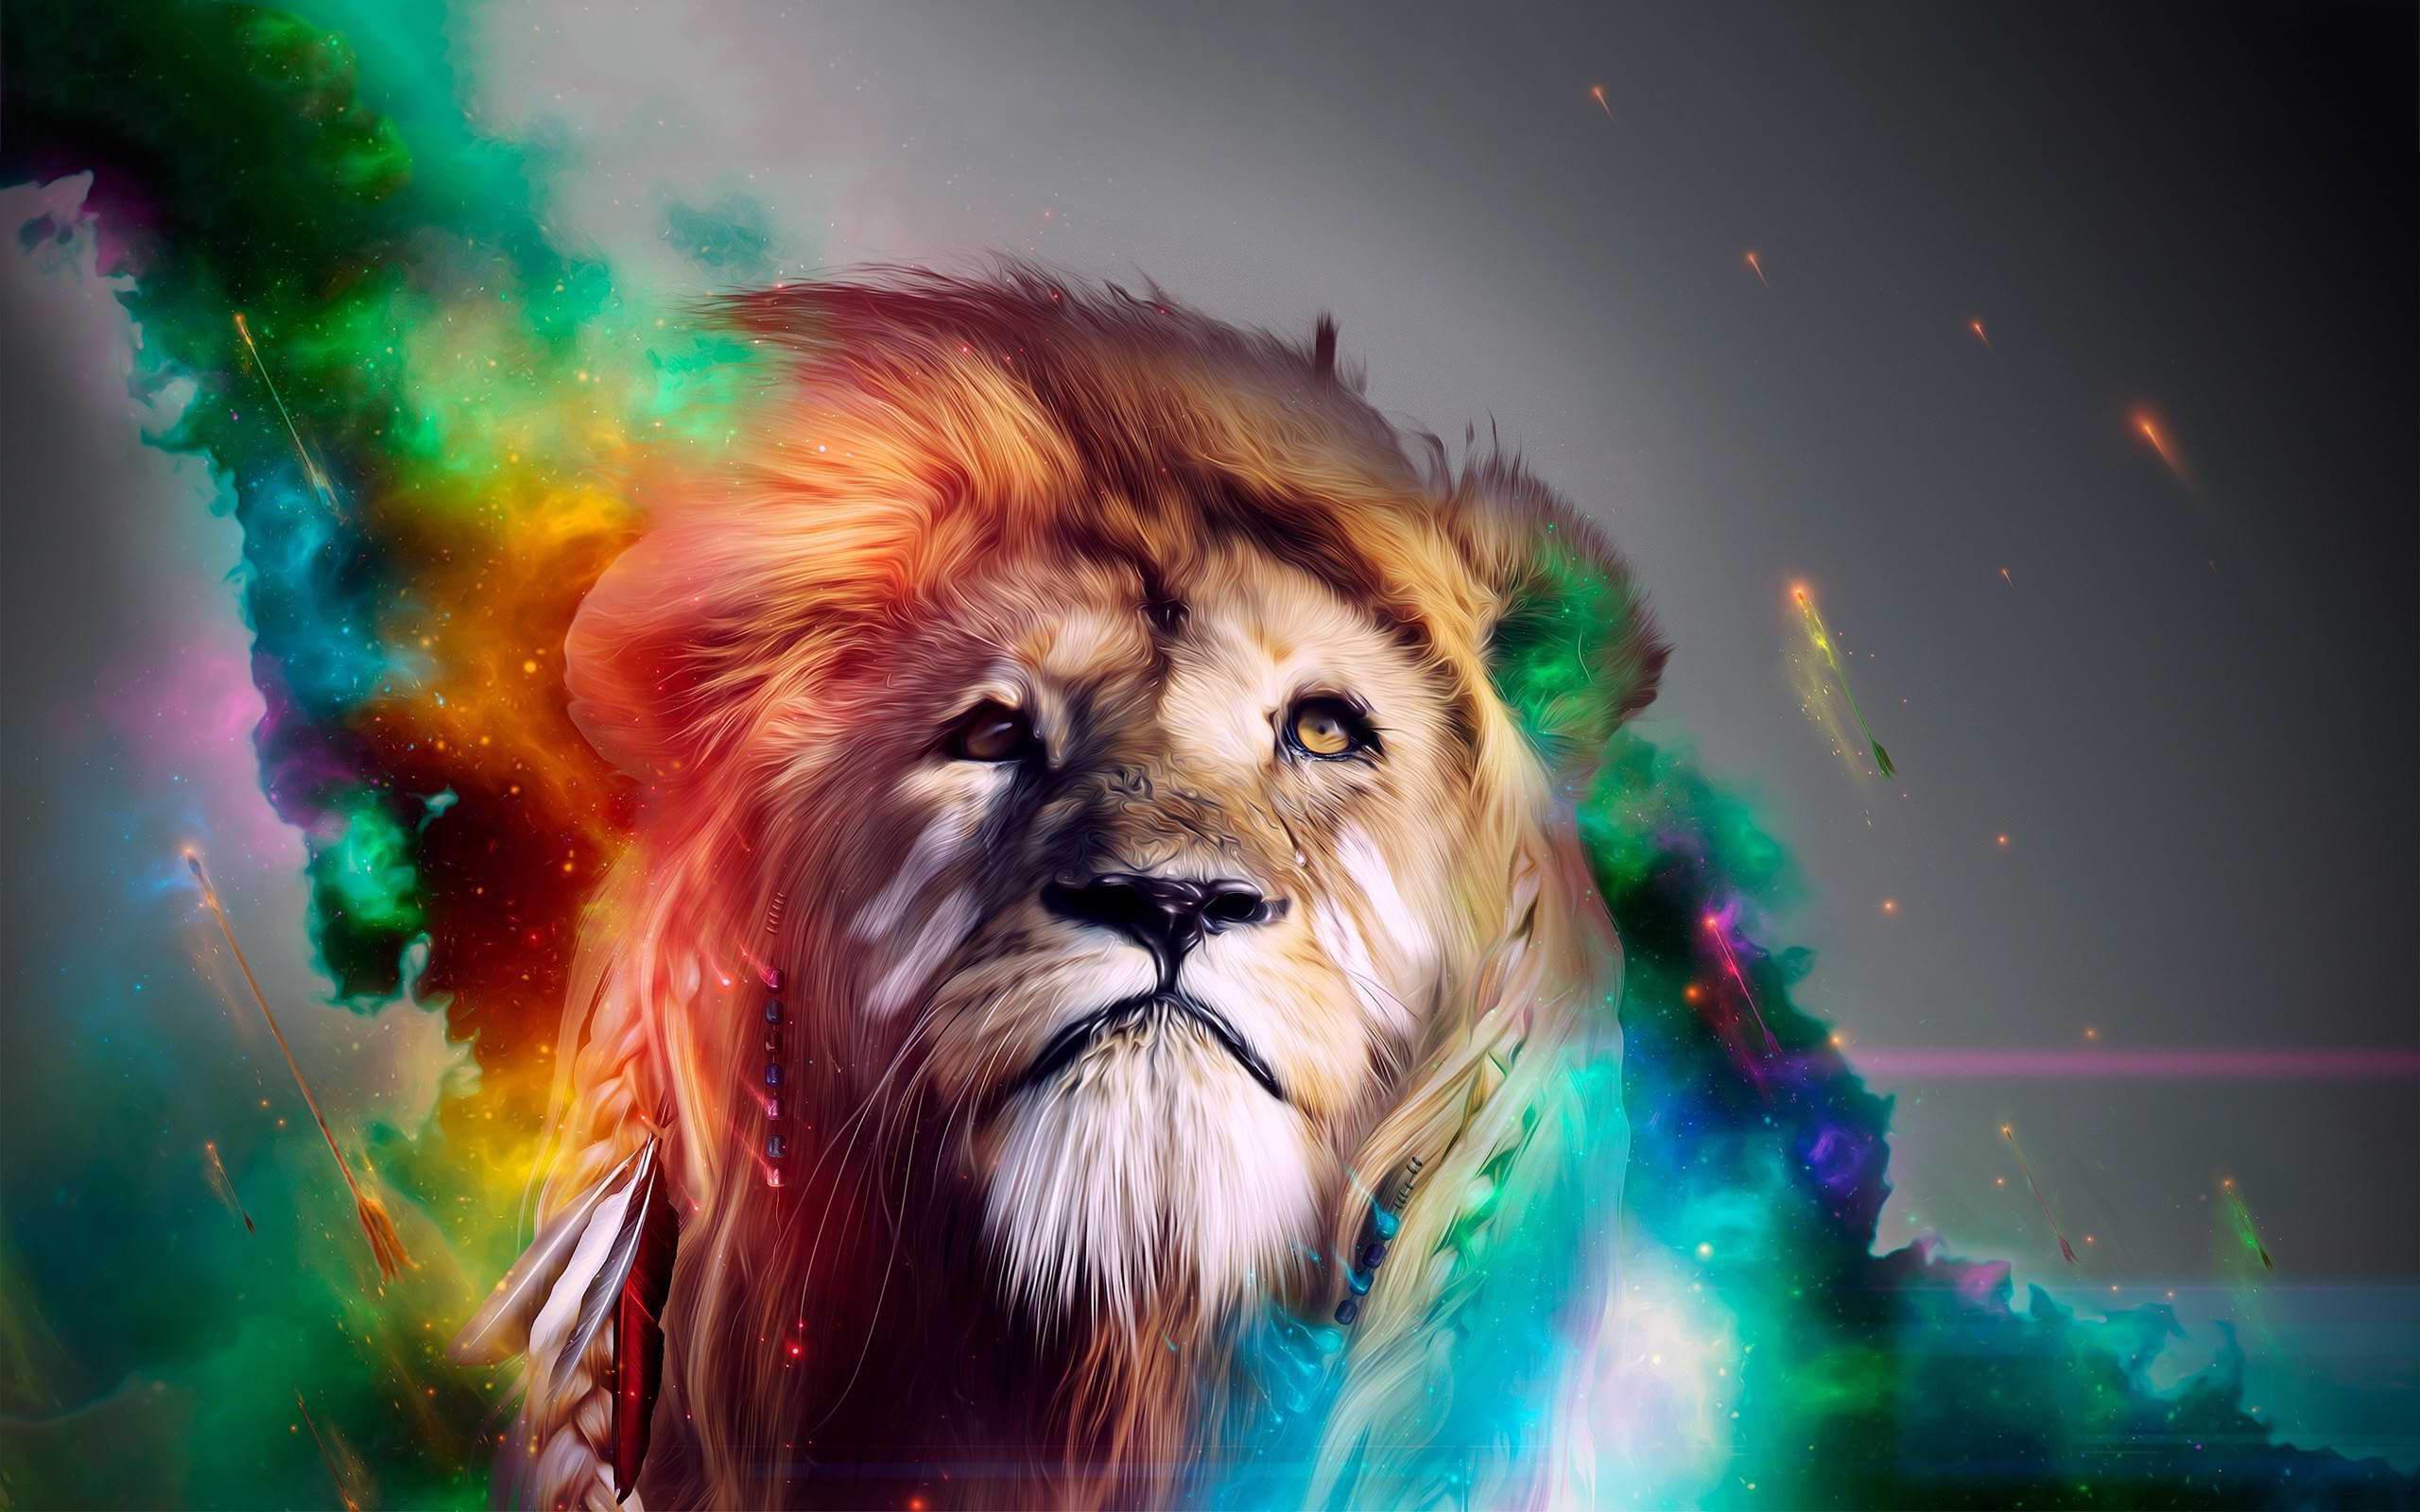 Rainbow Lion Wallpaper 57 Images